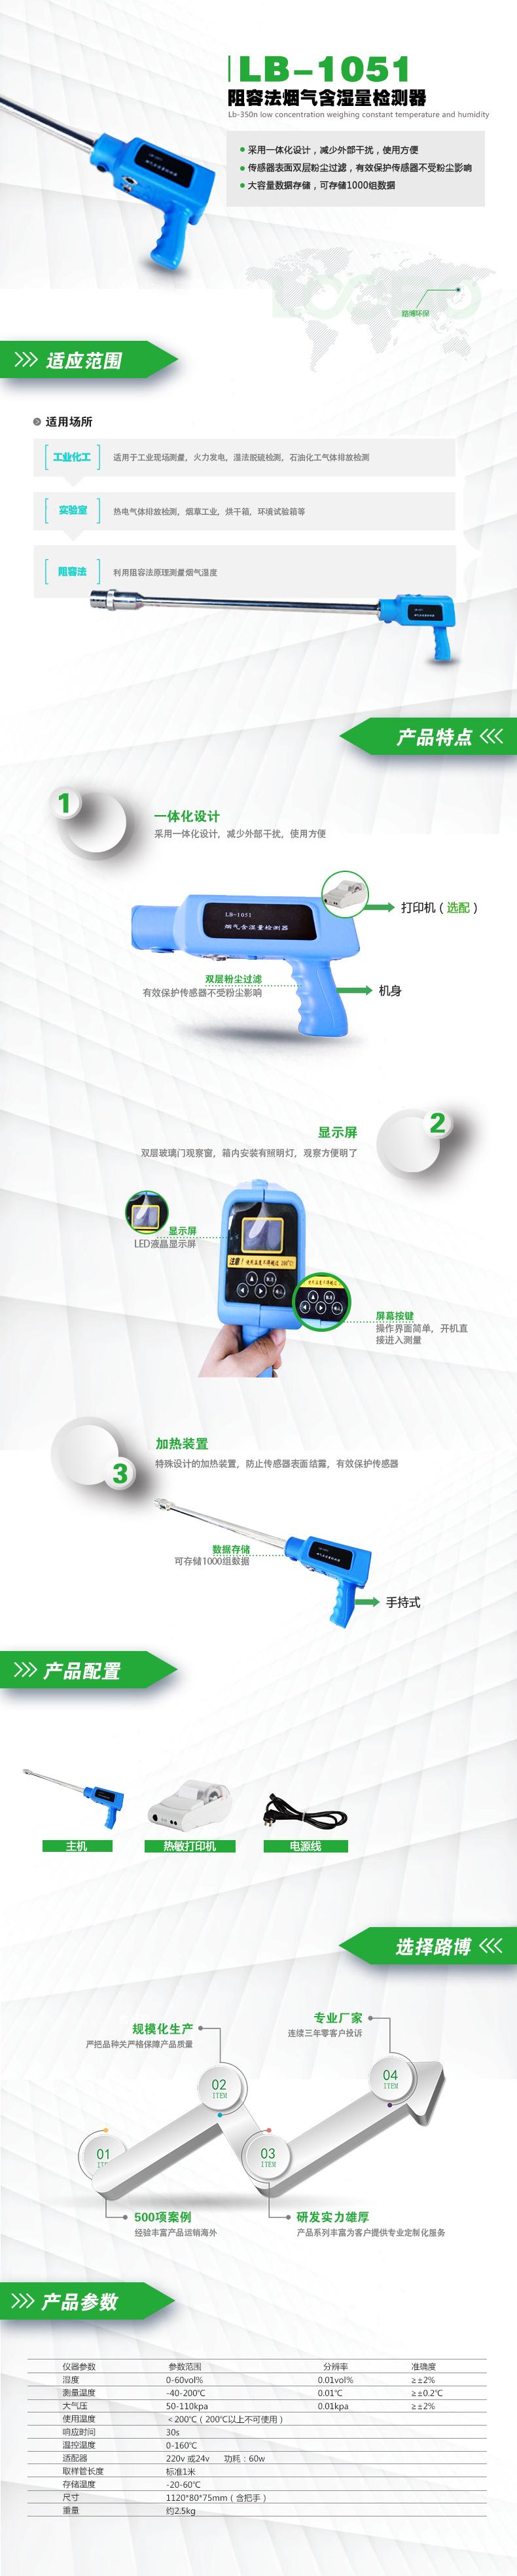 <strong>LB-1051型阻容法烟气含湿量检测器</strong>.jpg